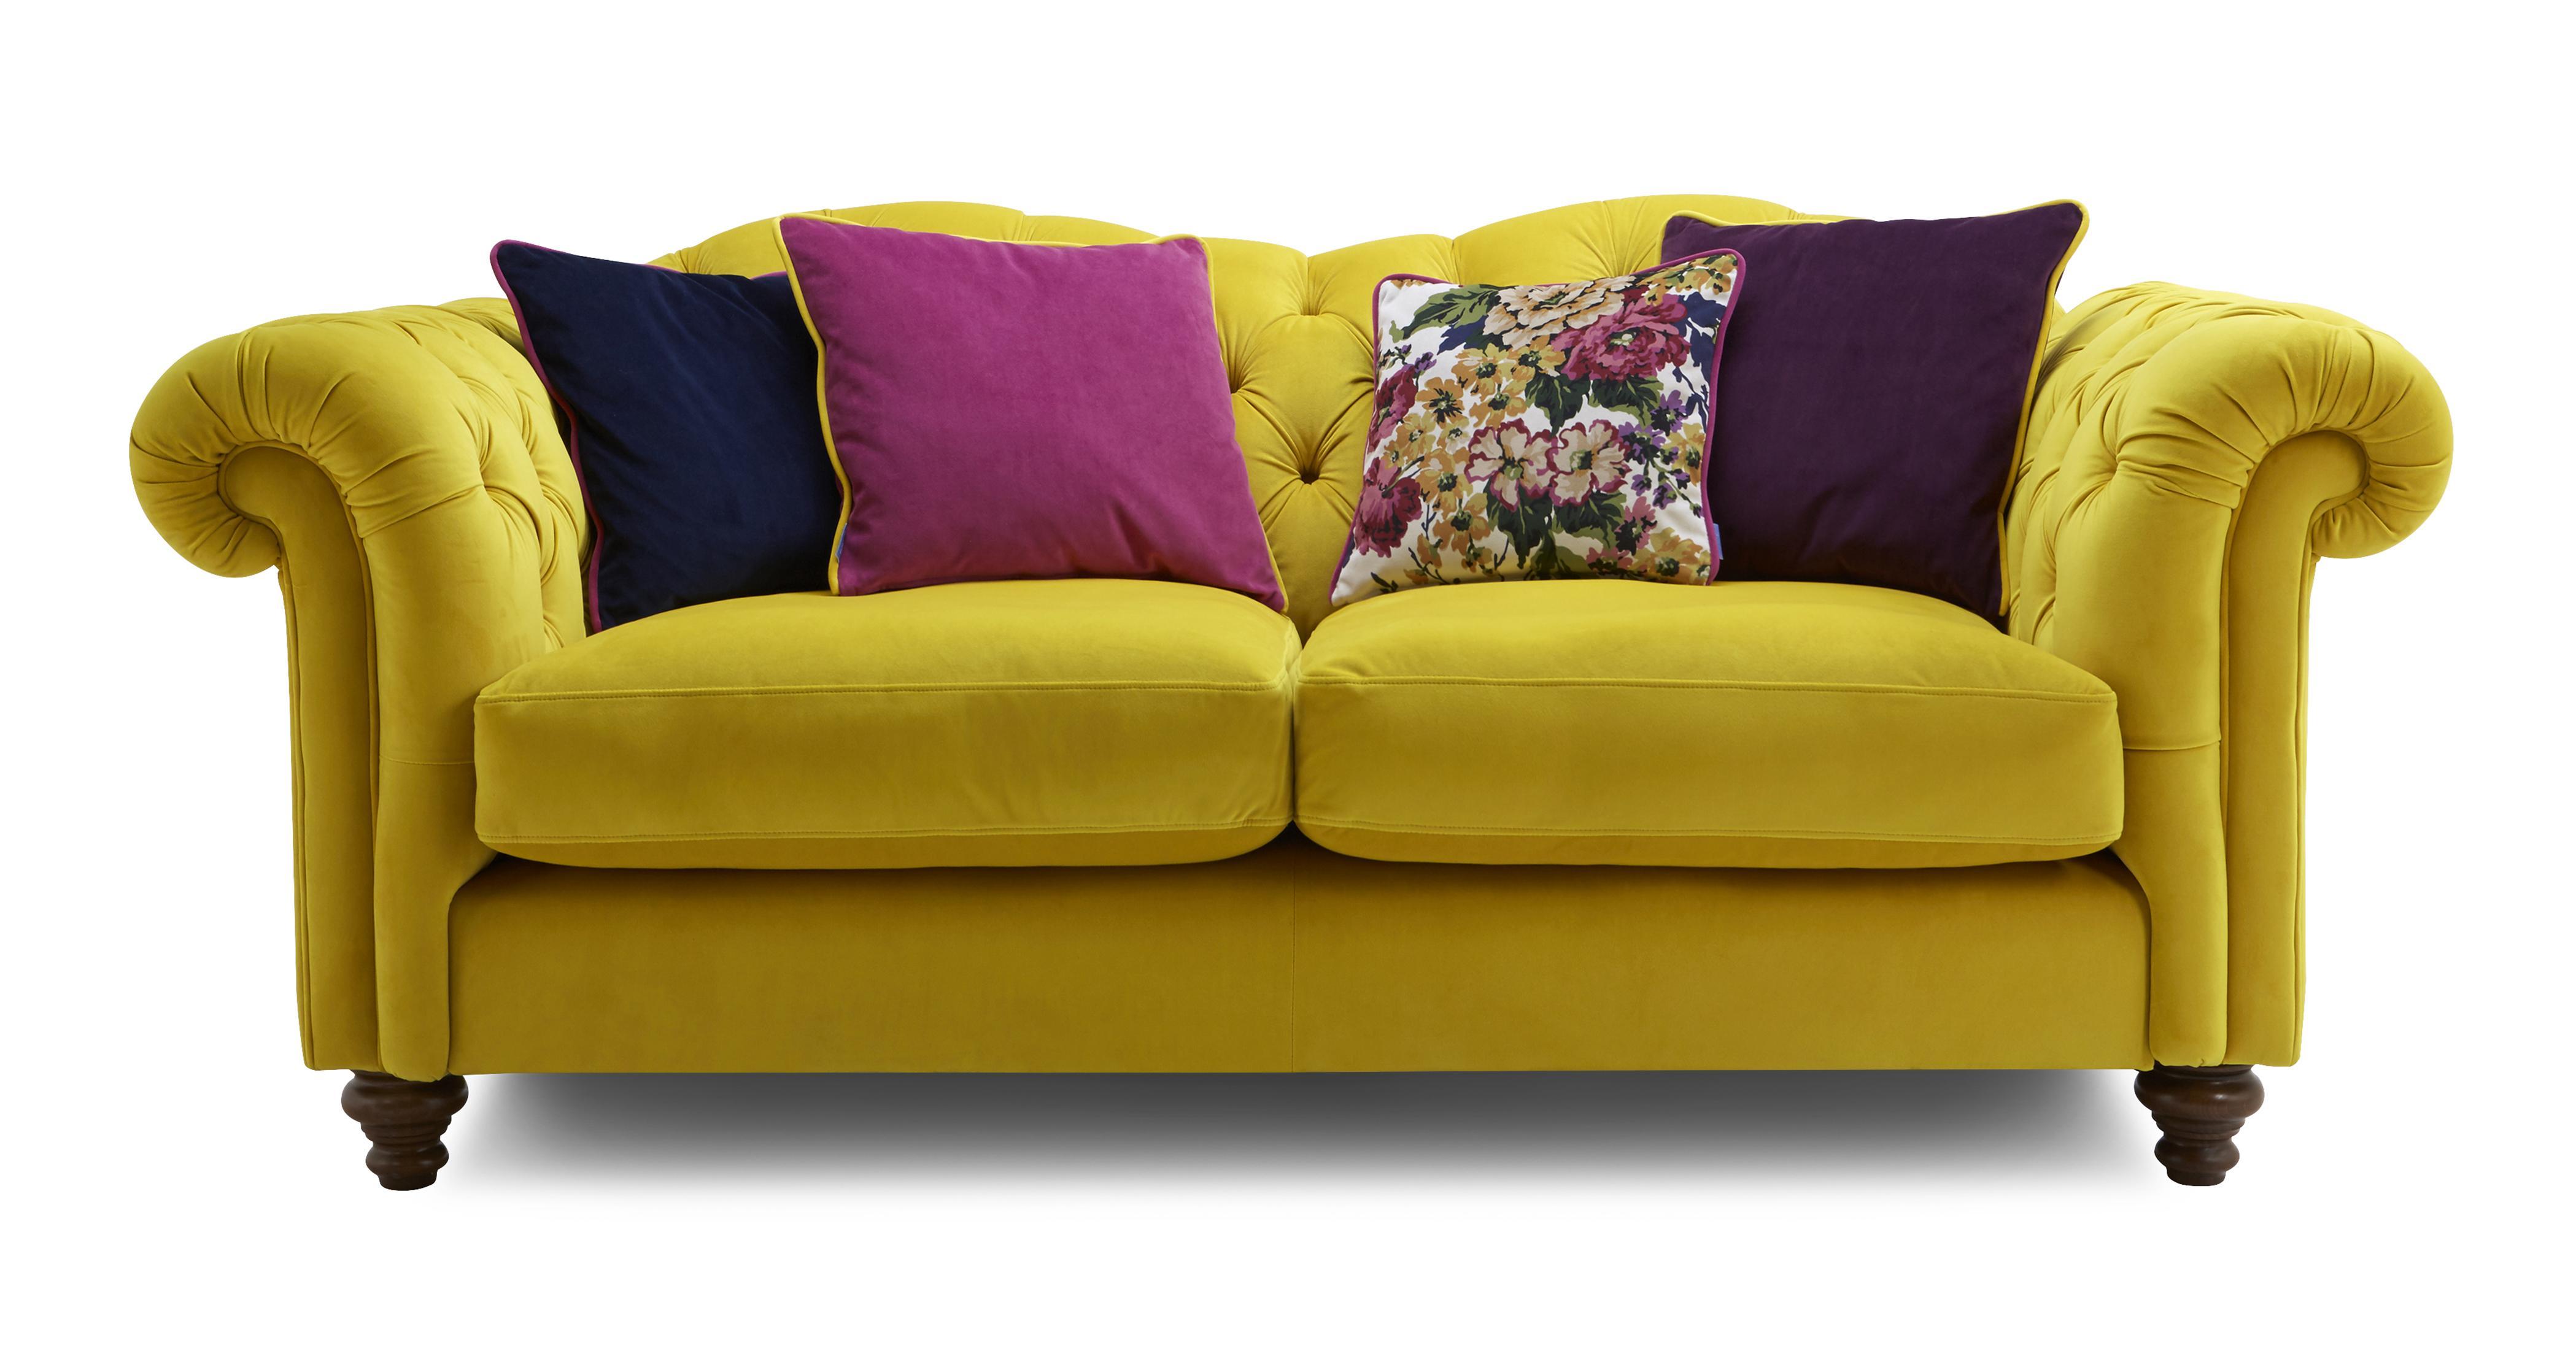 yellow sofa 36 0 ° UWGMFVB